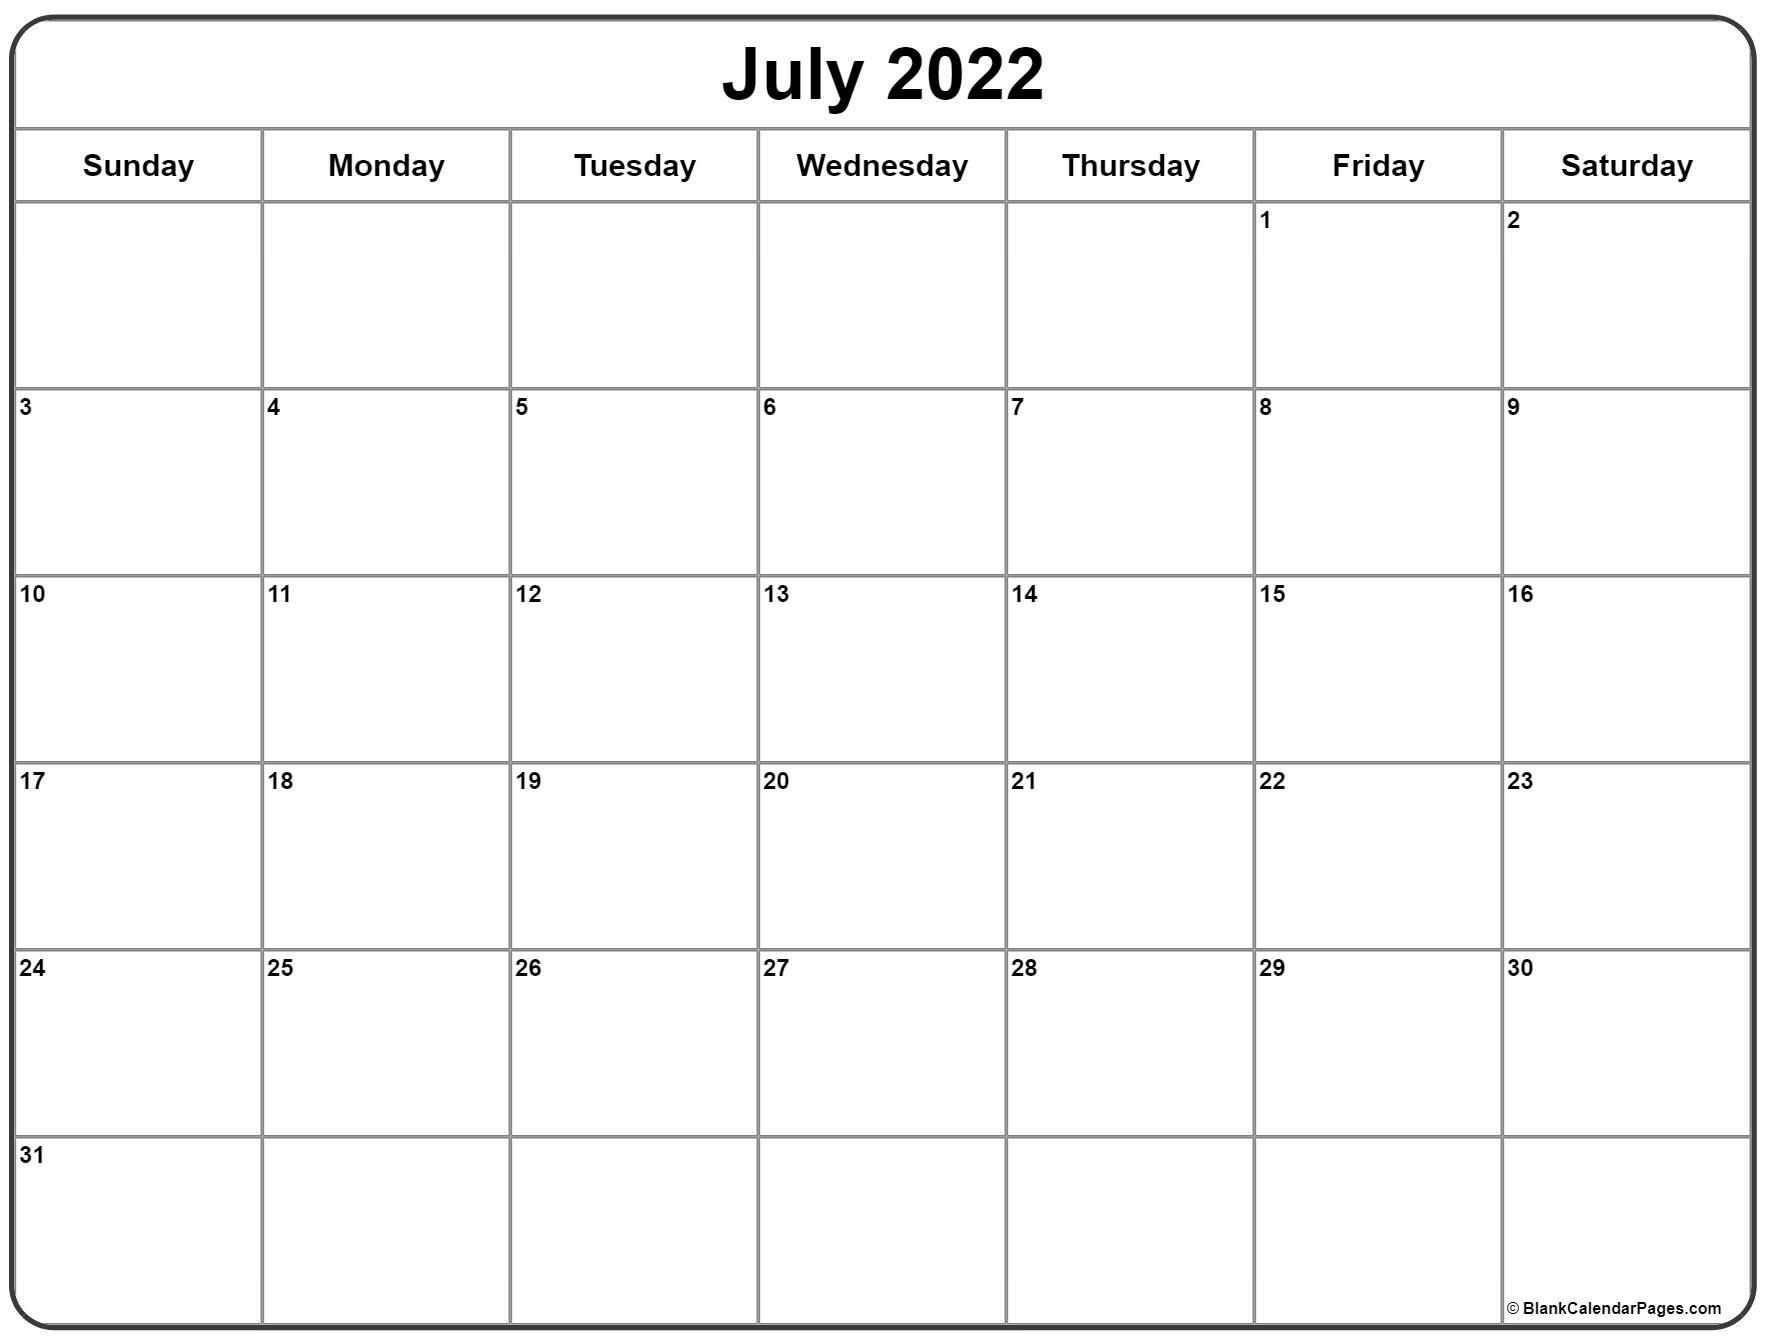 July 2022 Calendar | Free Printable Calendar Templates in Print July 2022 Ckander